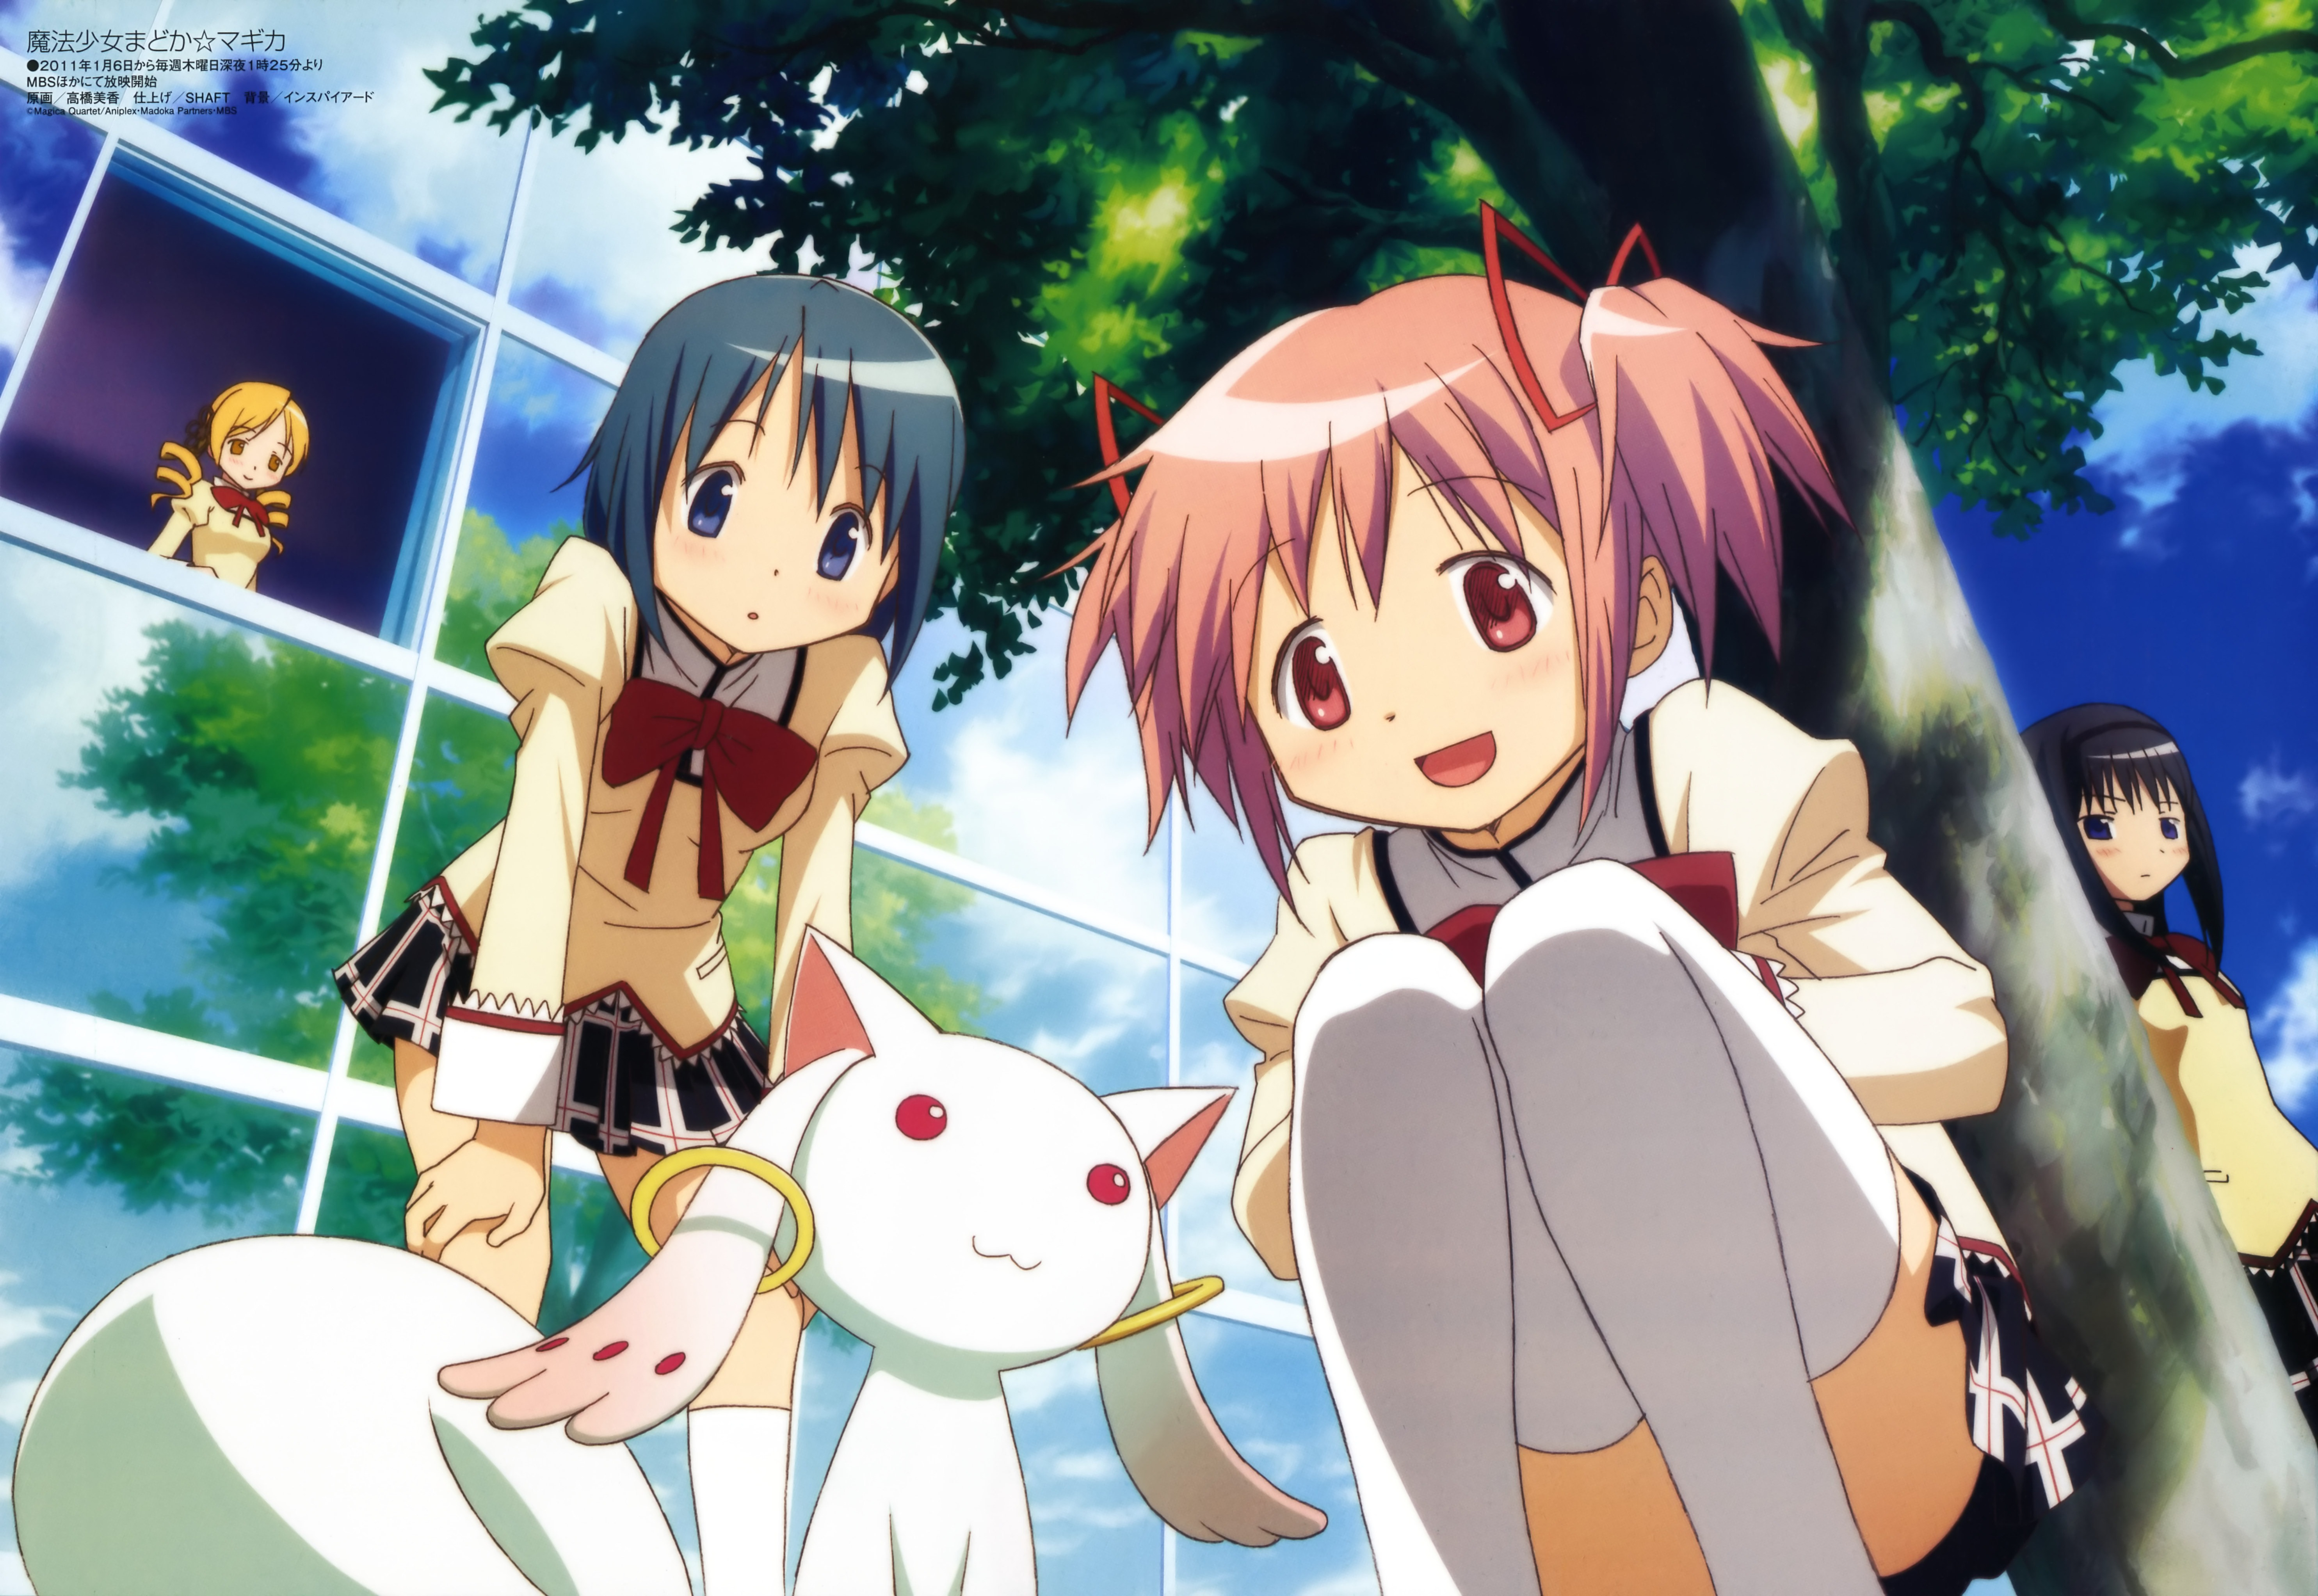 Top 20 Anime You Should Watch on Your Last Day Alive Mahou Shoujo Madoka Magica